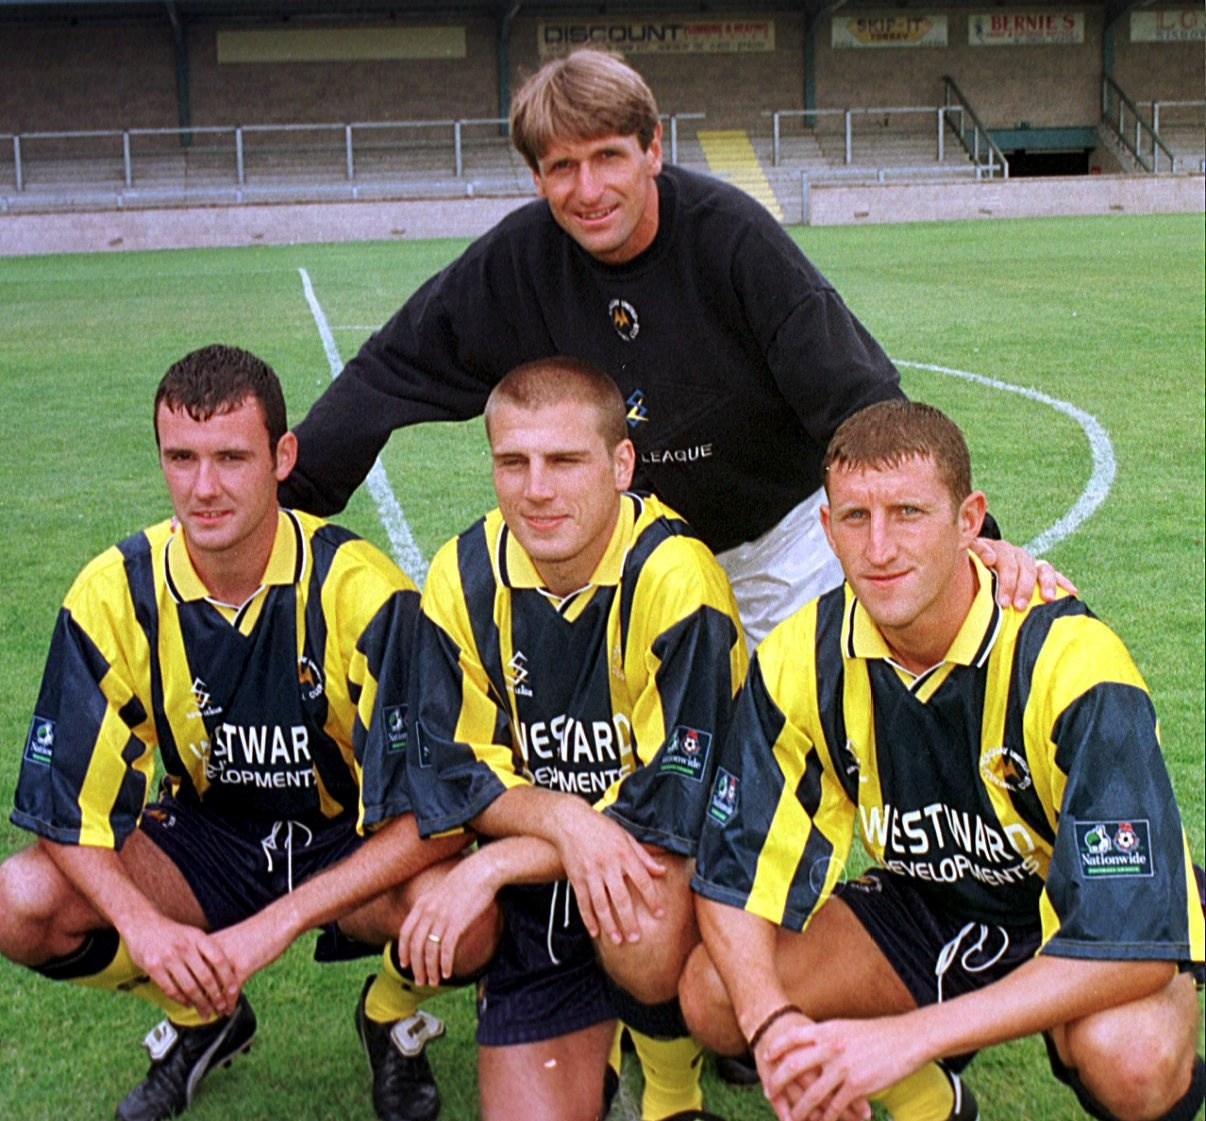 Gibbs, Gurney, Robinson and Hodges